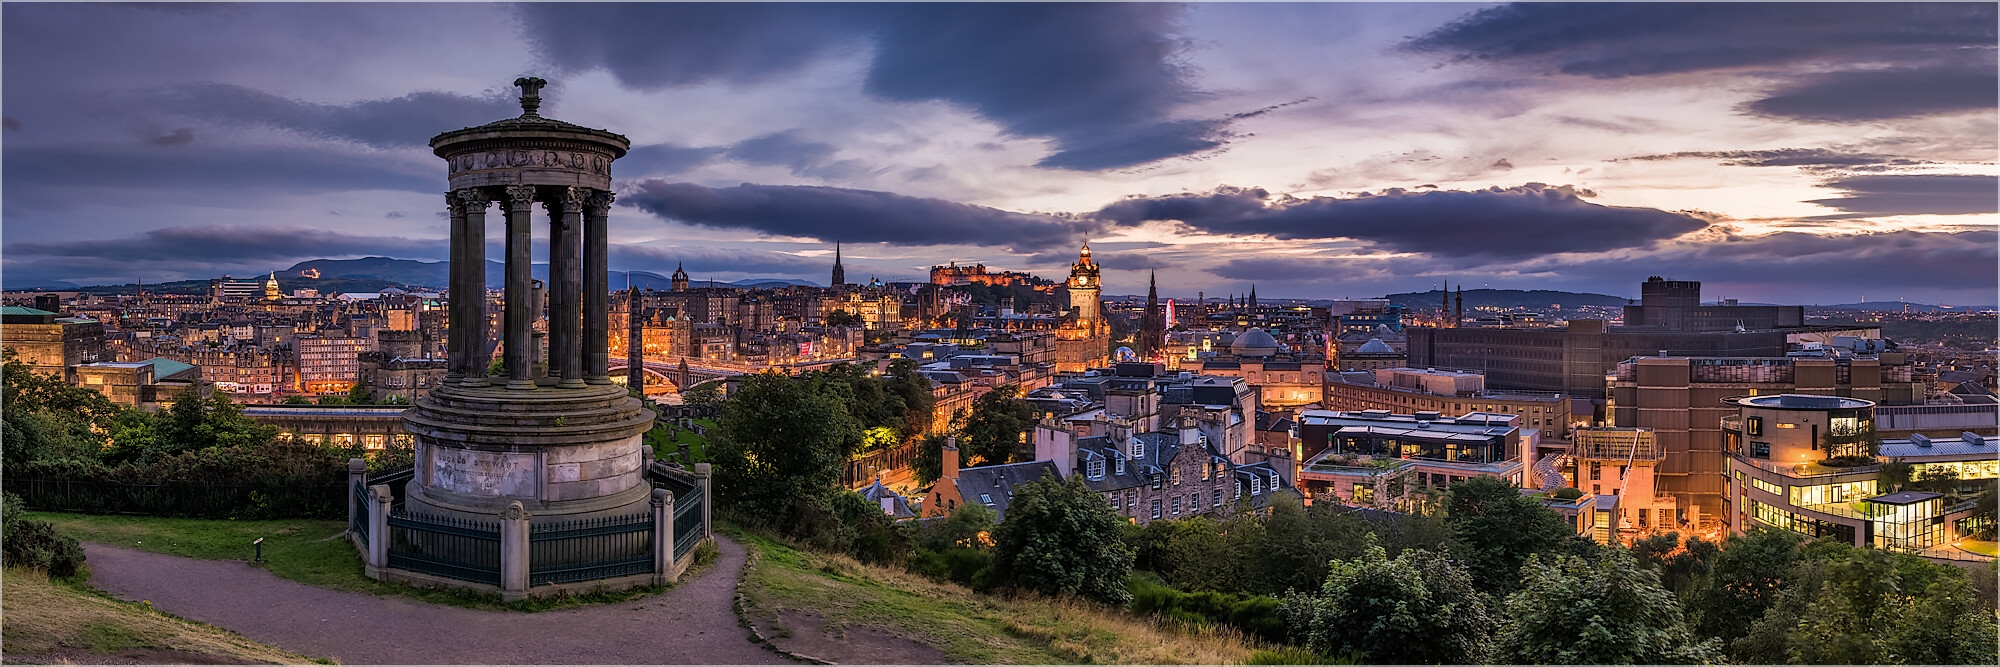 Panoramafoto Calton Hill Edinburgh Schottland